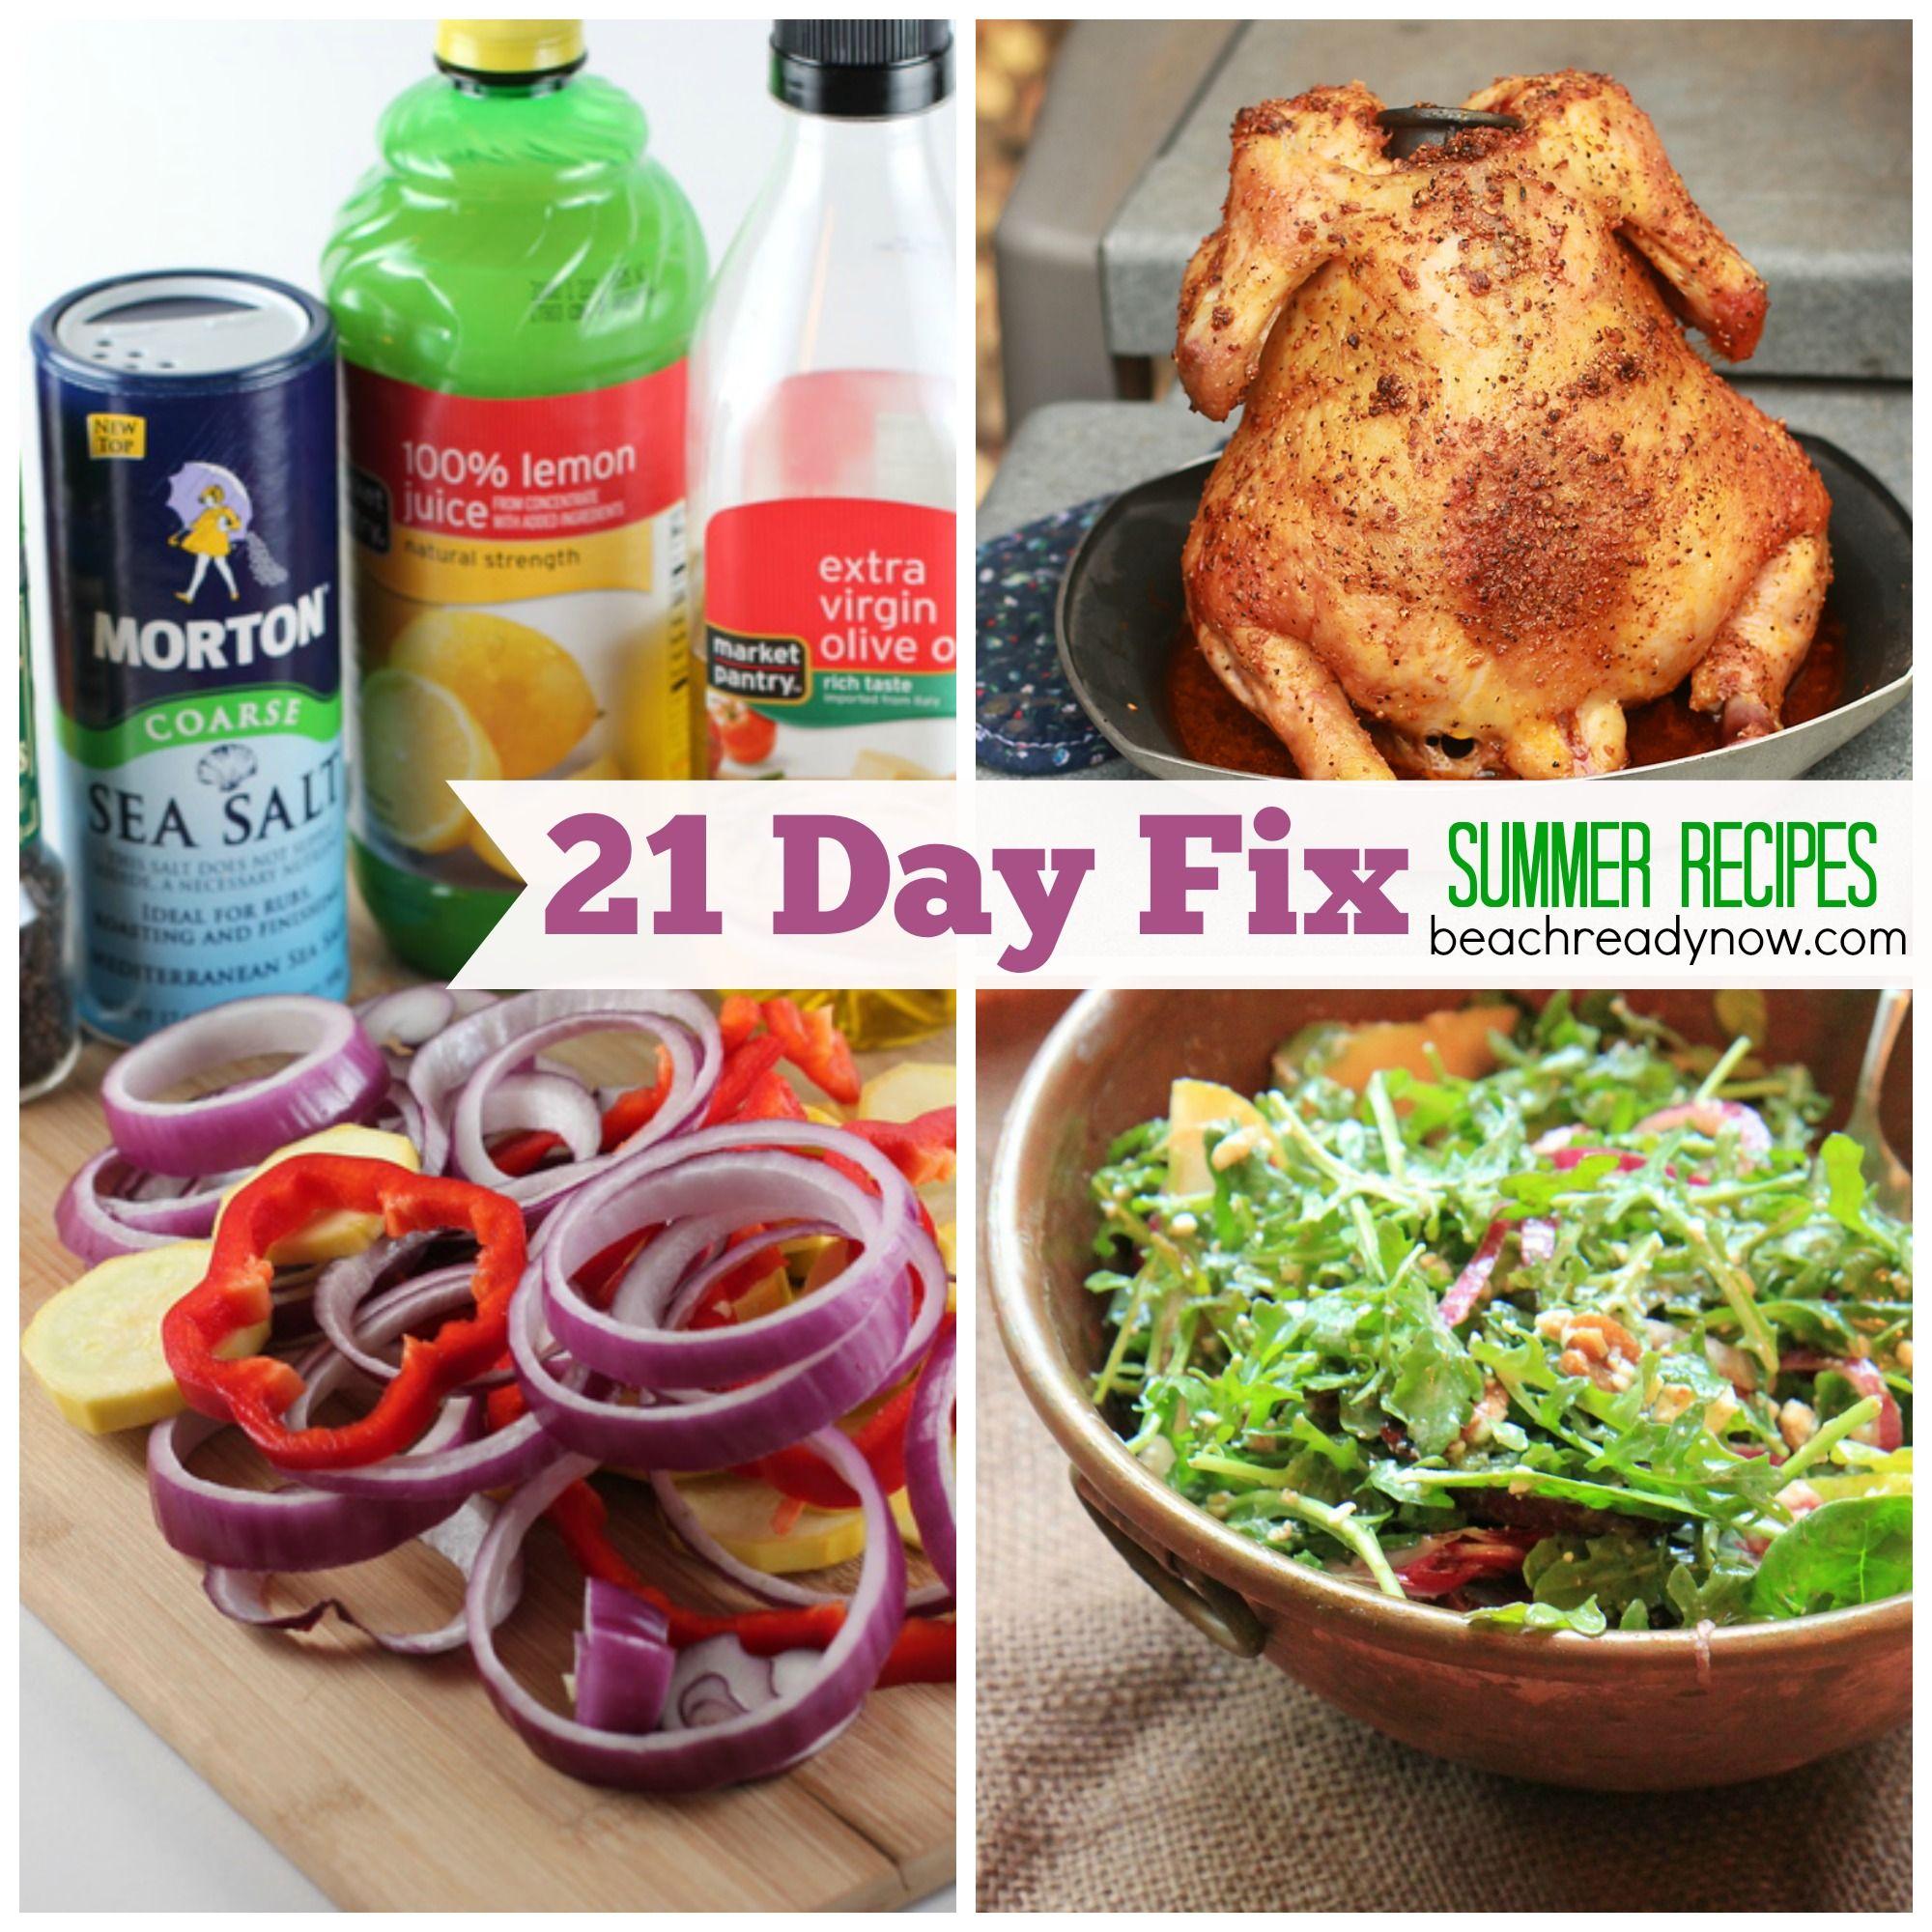 healthy summer recipes potlucks grilling and 21st